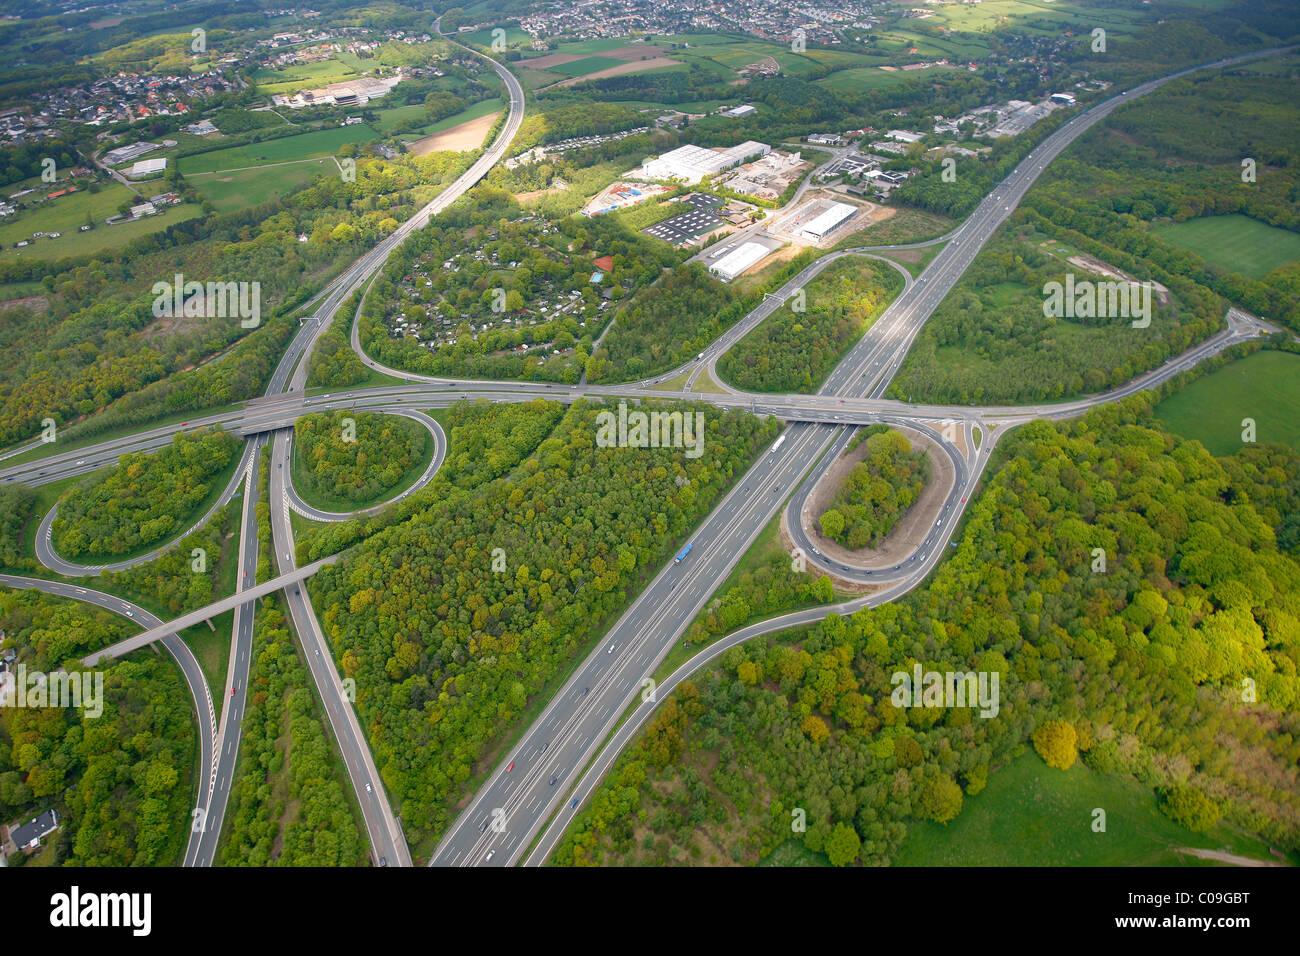 Aerial view, interchange A1 and A43 motorways, Sprockhoevel slip way, Ruhrgebiet region, North Rhine-Westphalia, - Stock Image